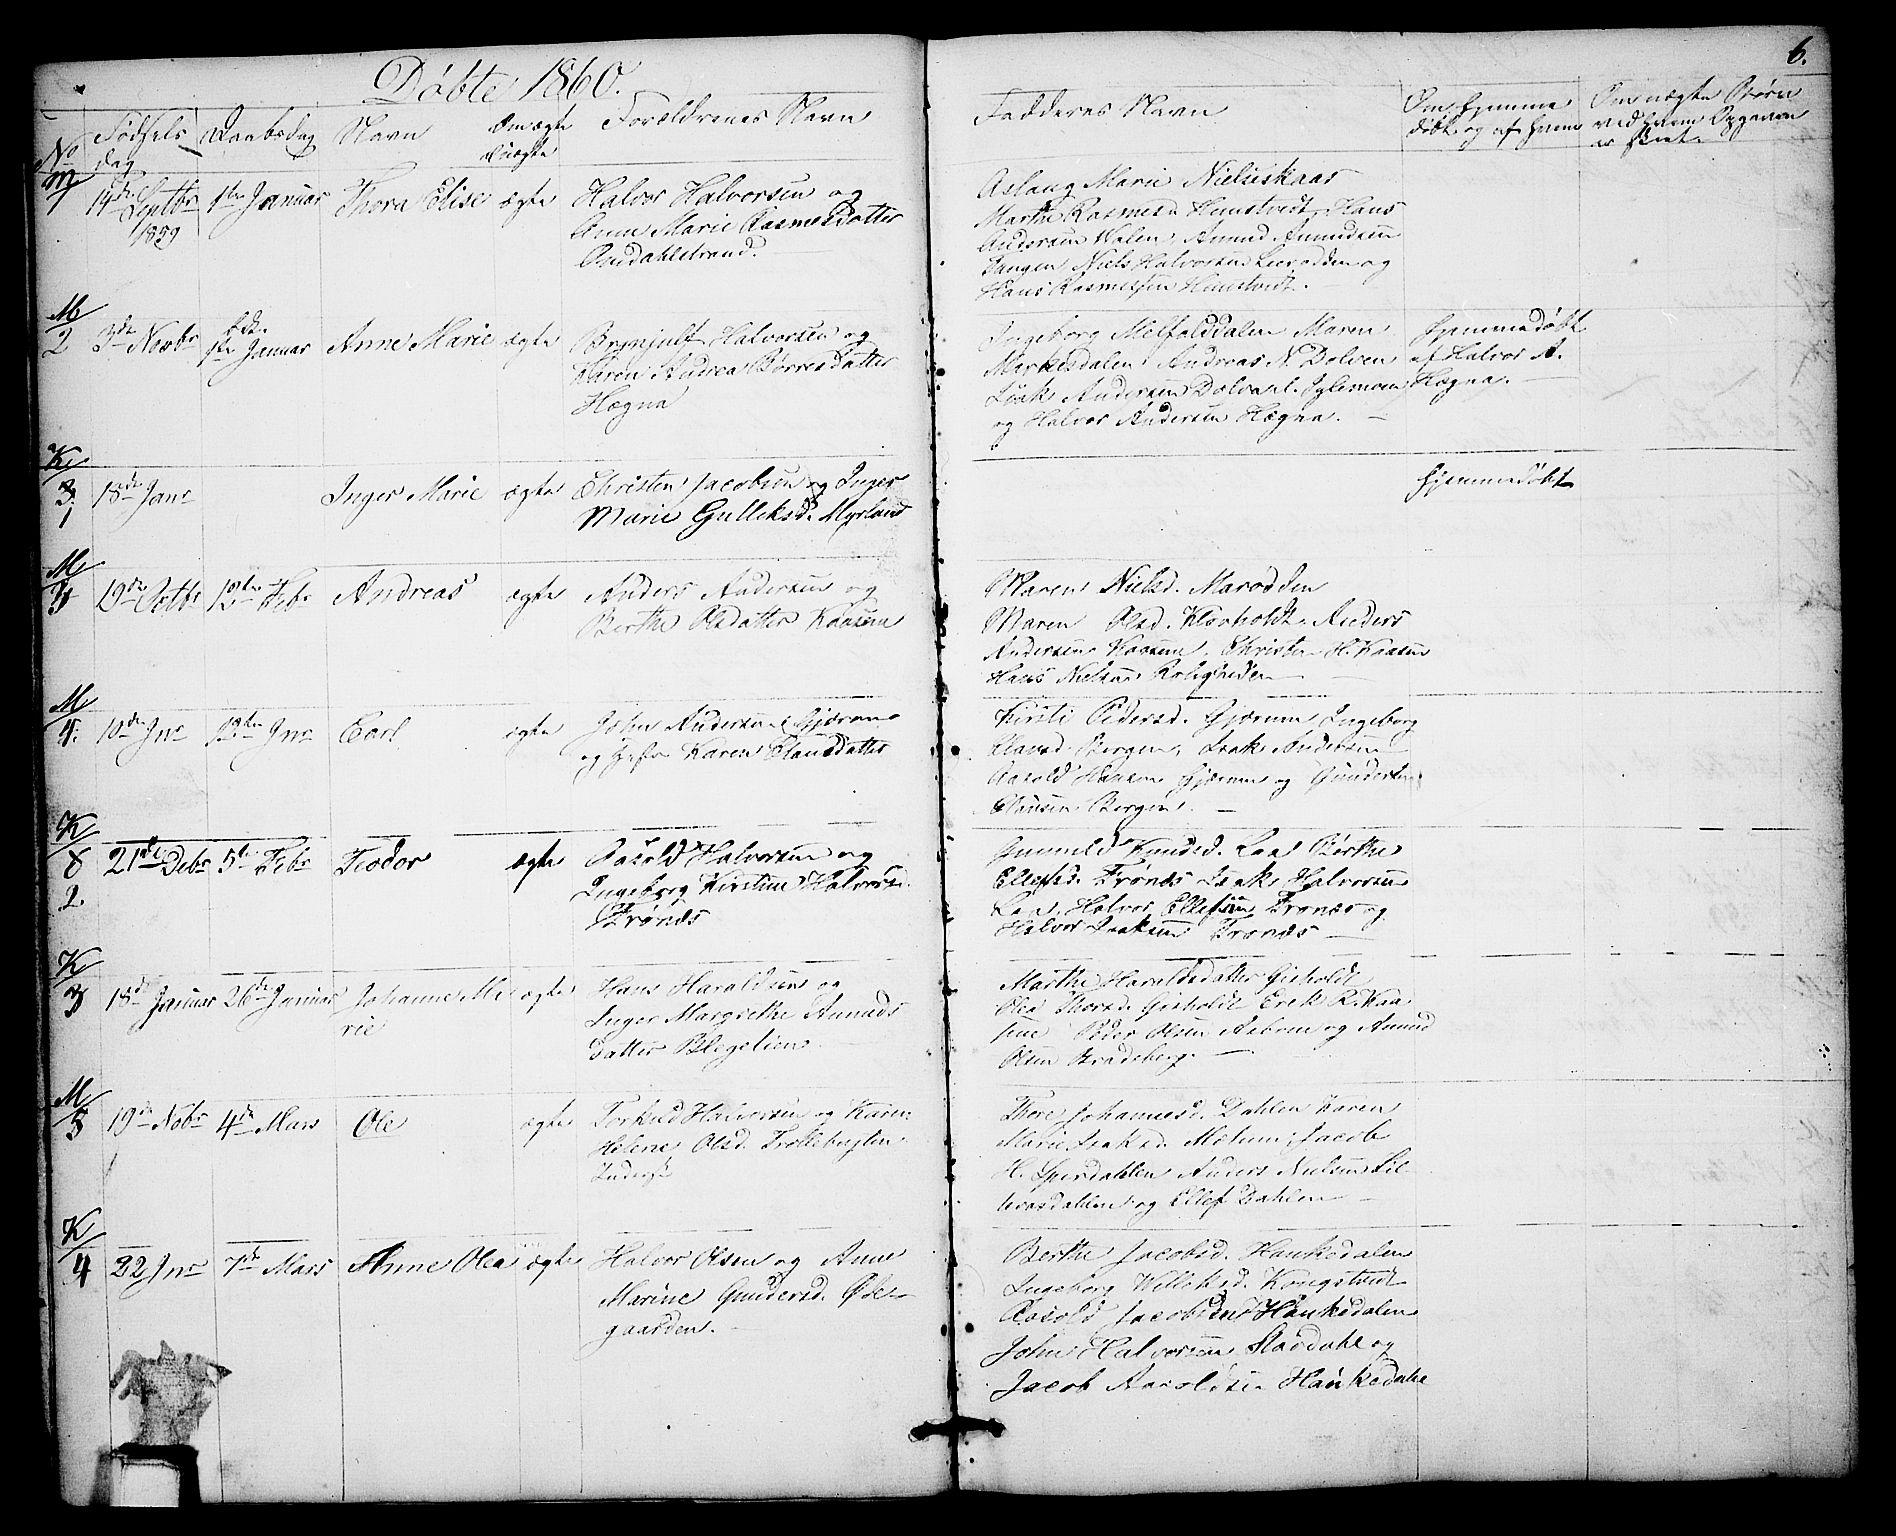 SAKO, Solum kirkebøker, G/Gb/L0002: Klokkerbok nr. II 2, 1859-1879, s. 6